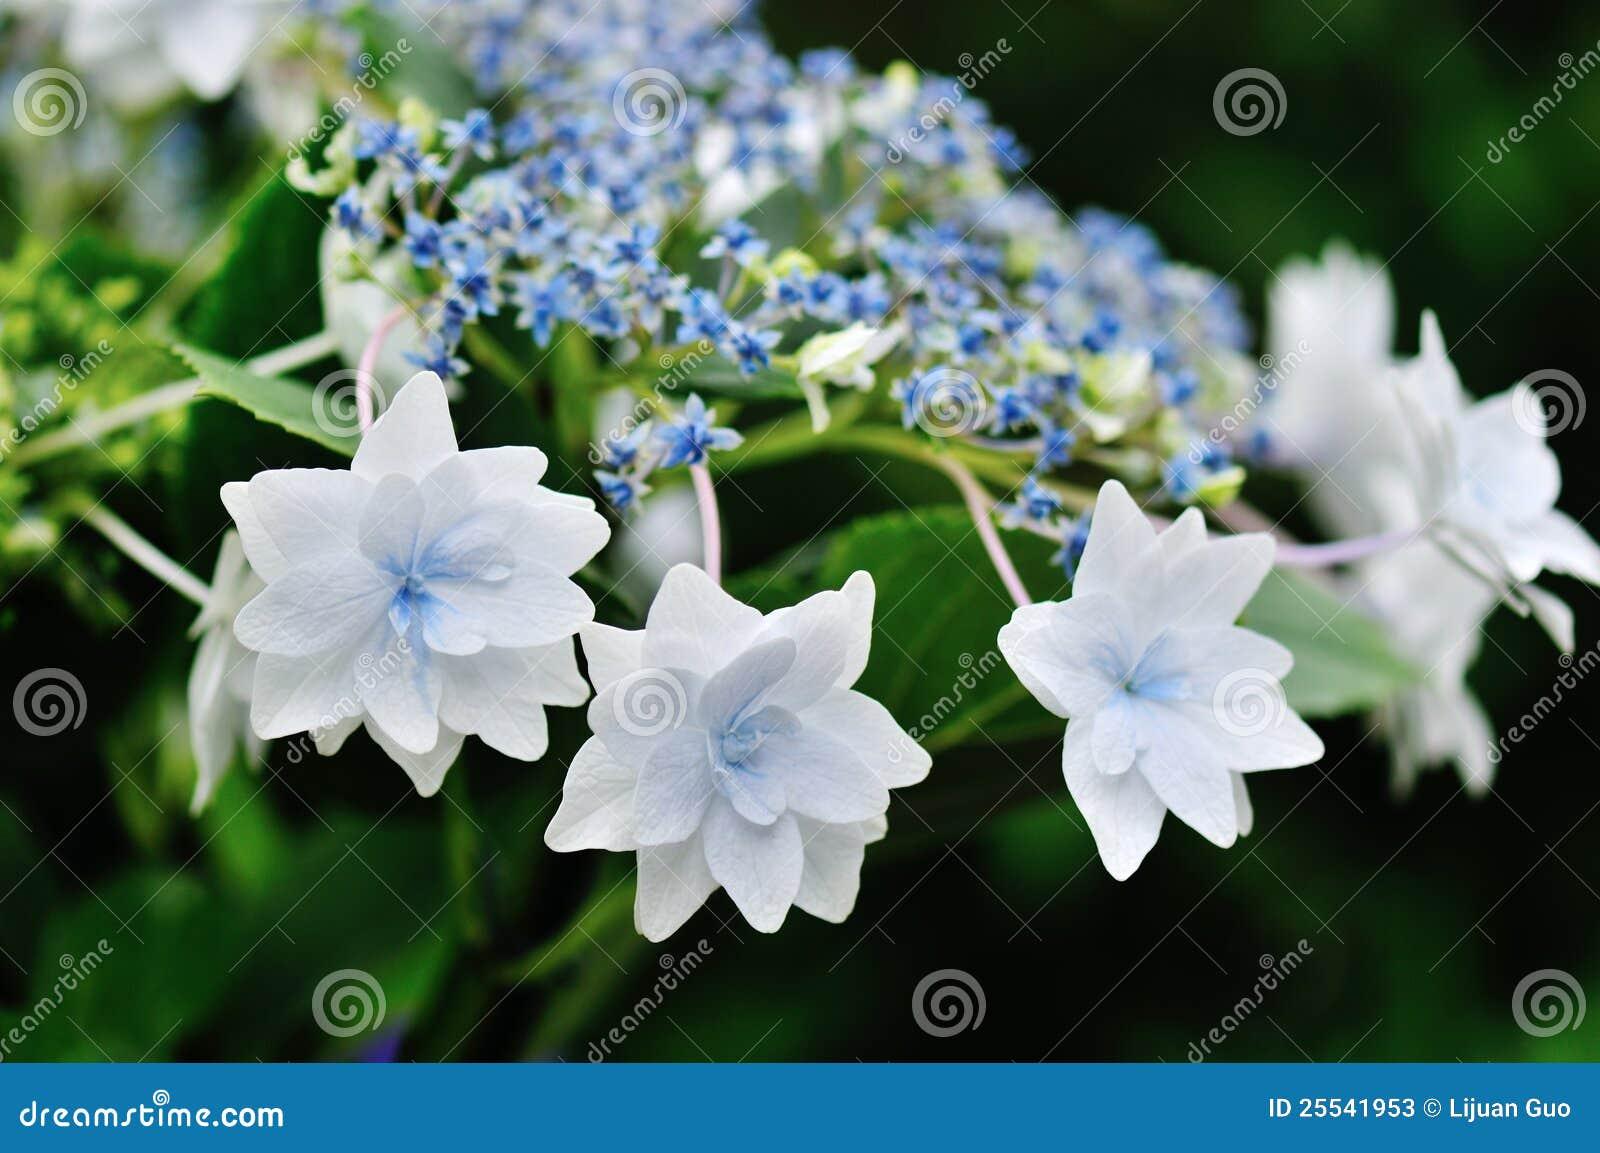 Shooting Star Hydrangea Stock Image Image Of Spring